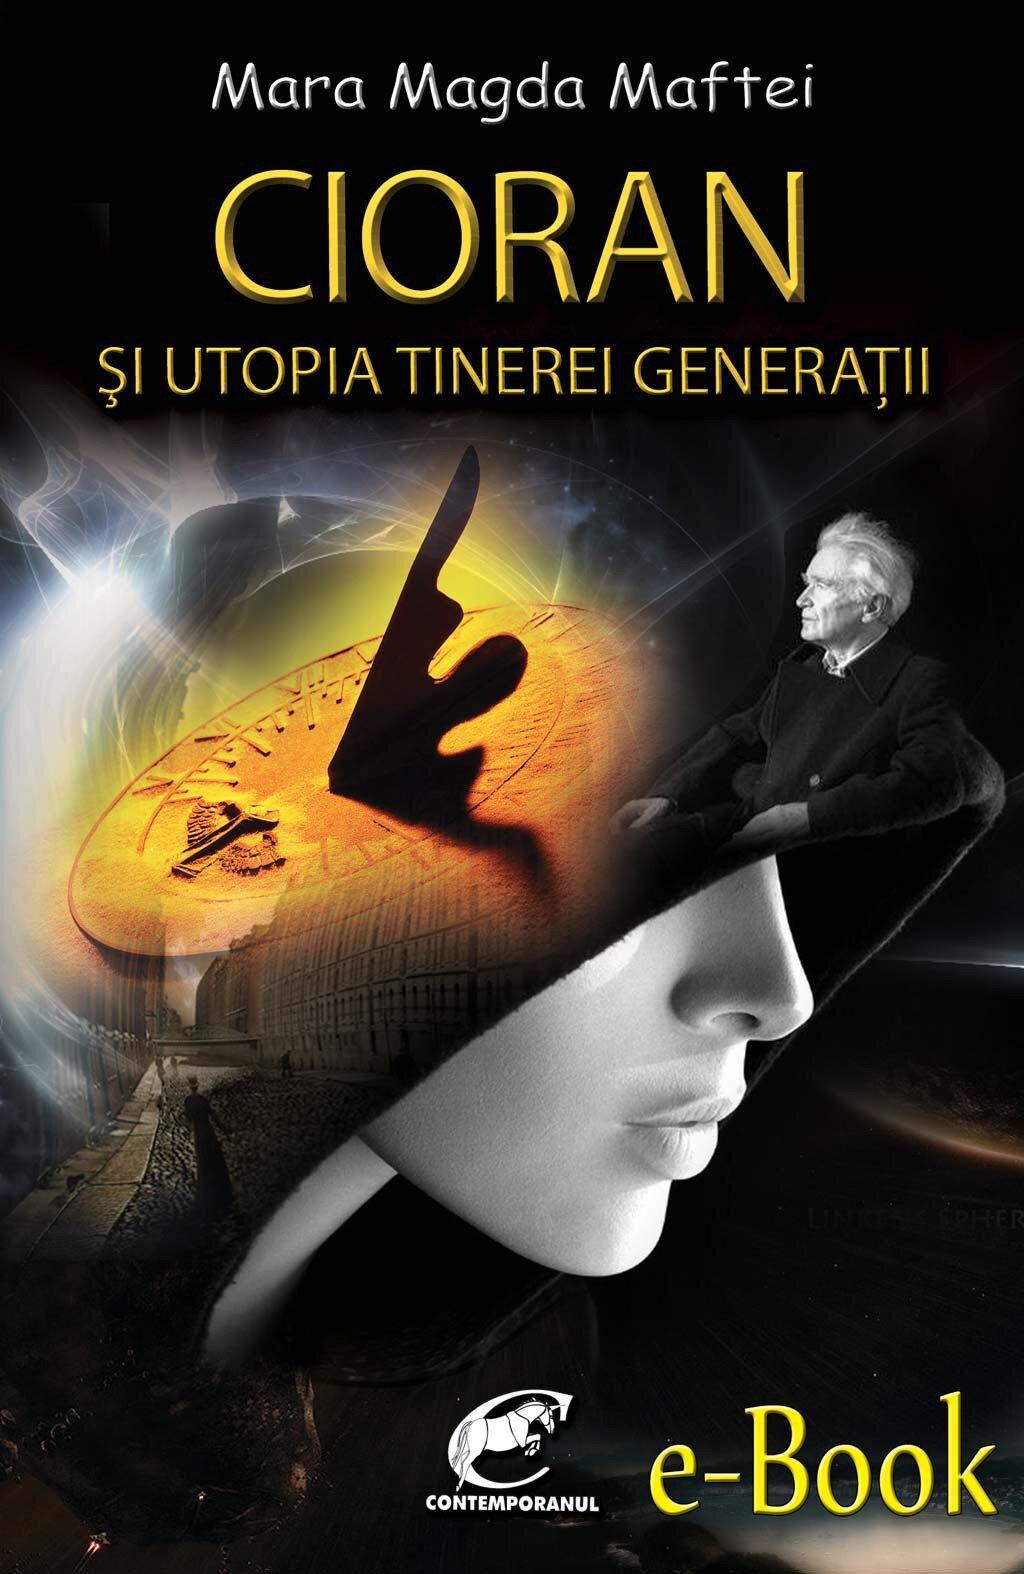 Cioran si utopia tinerei generatii PDF (Download eBook)